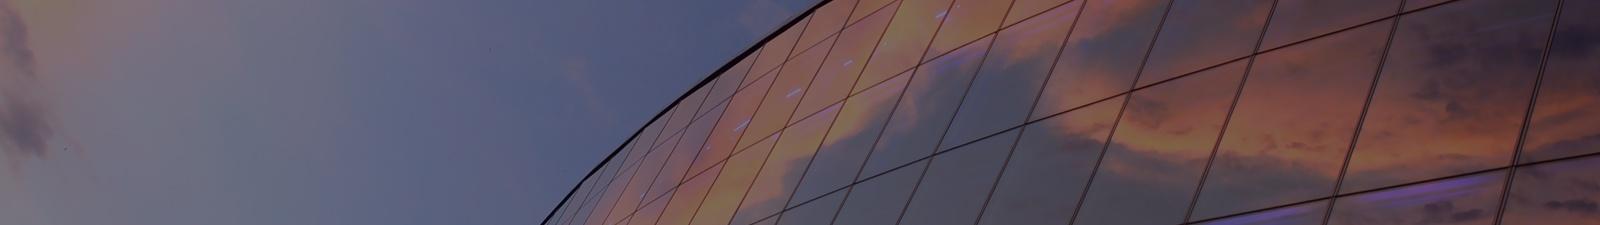 web-banner-7.jpg